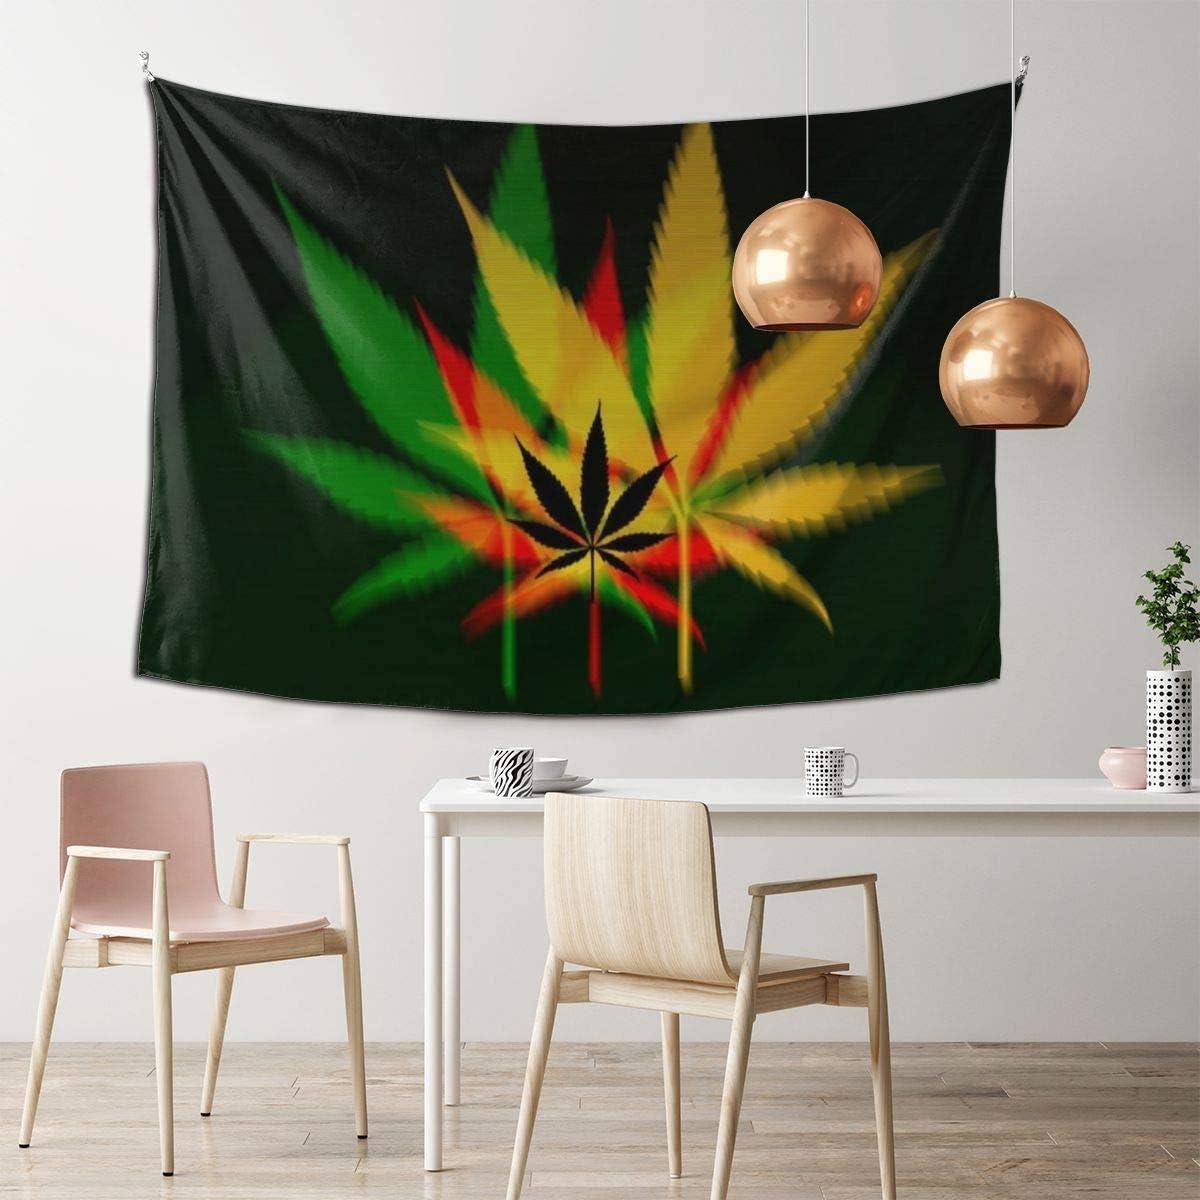 N/A Tapiz de marihuana con diseño de hojas de marihuana, decoración de pared, mandala playa, colcha intrincada india, tapiz de 101 x 152 cm